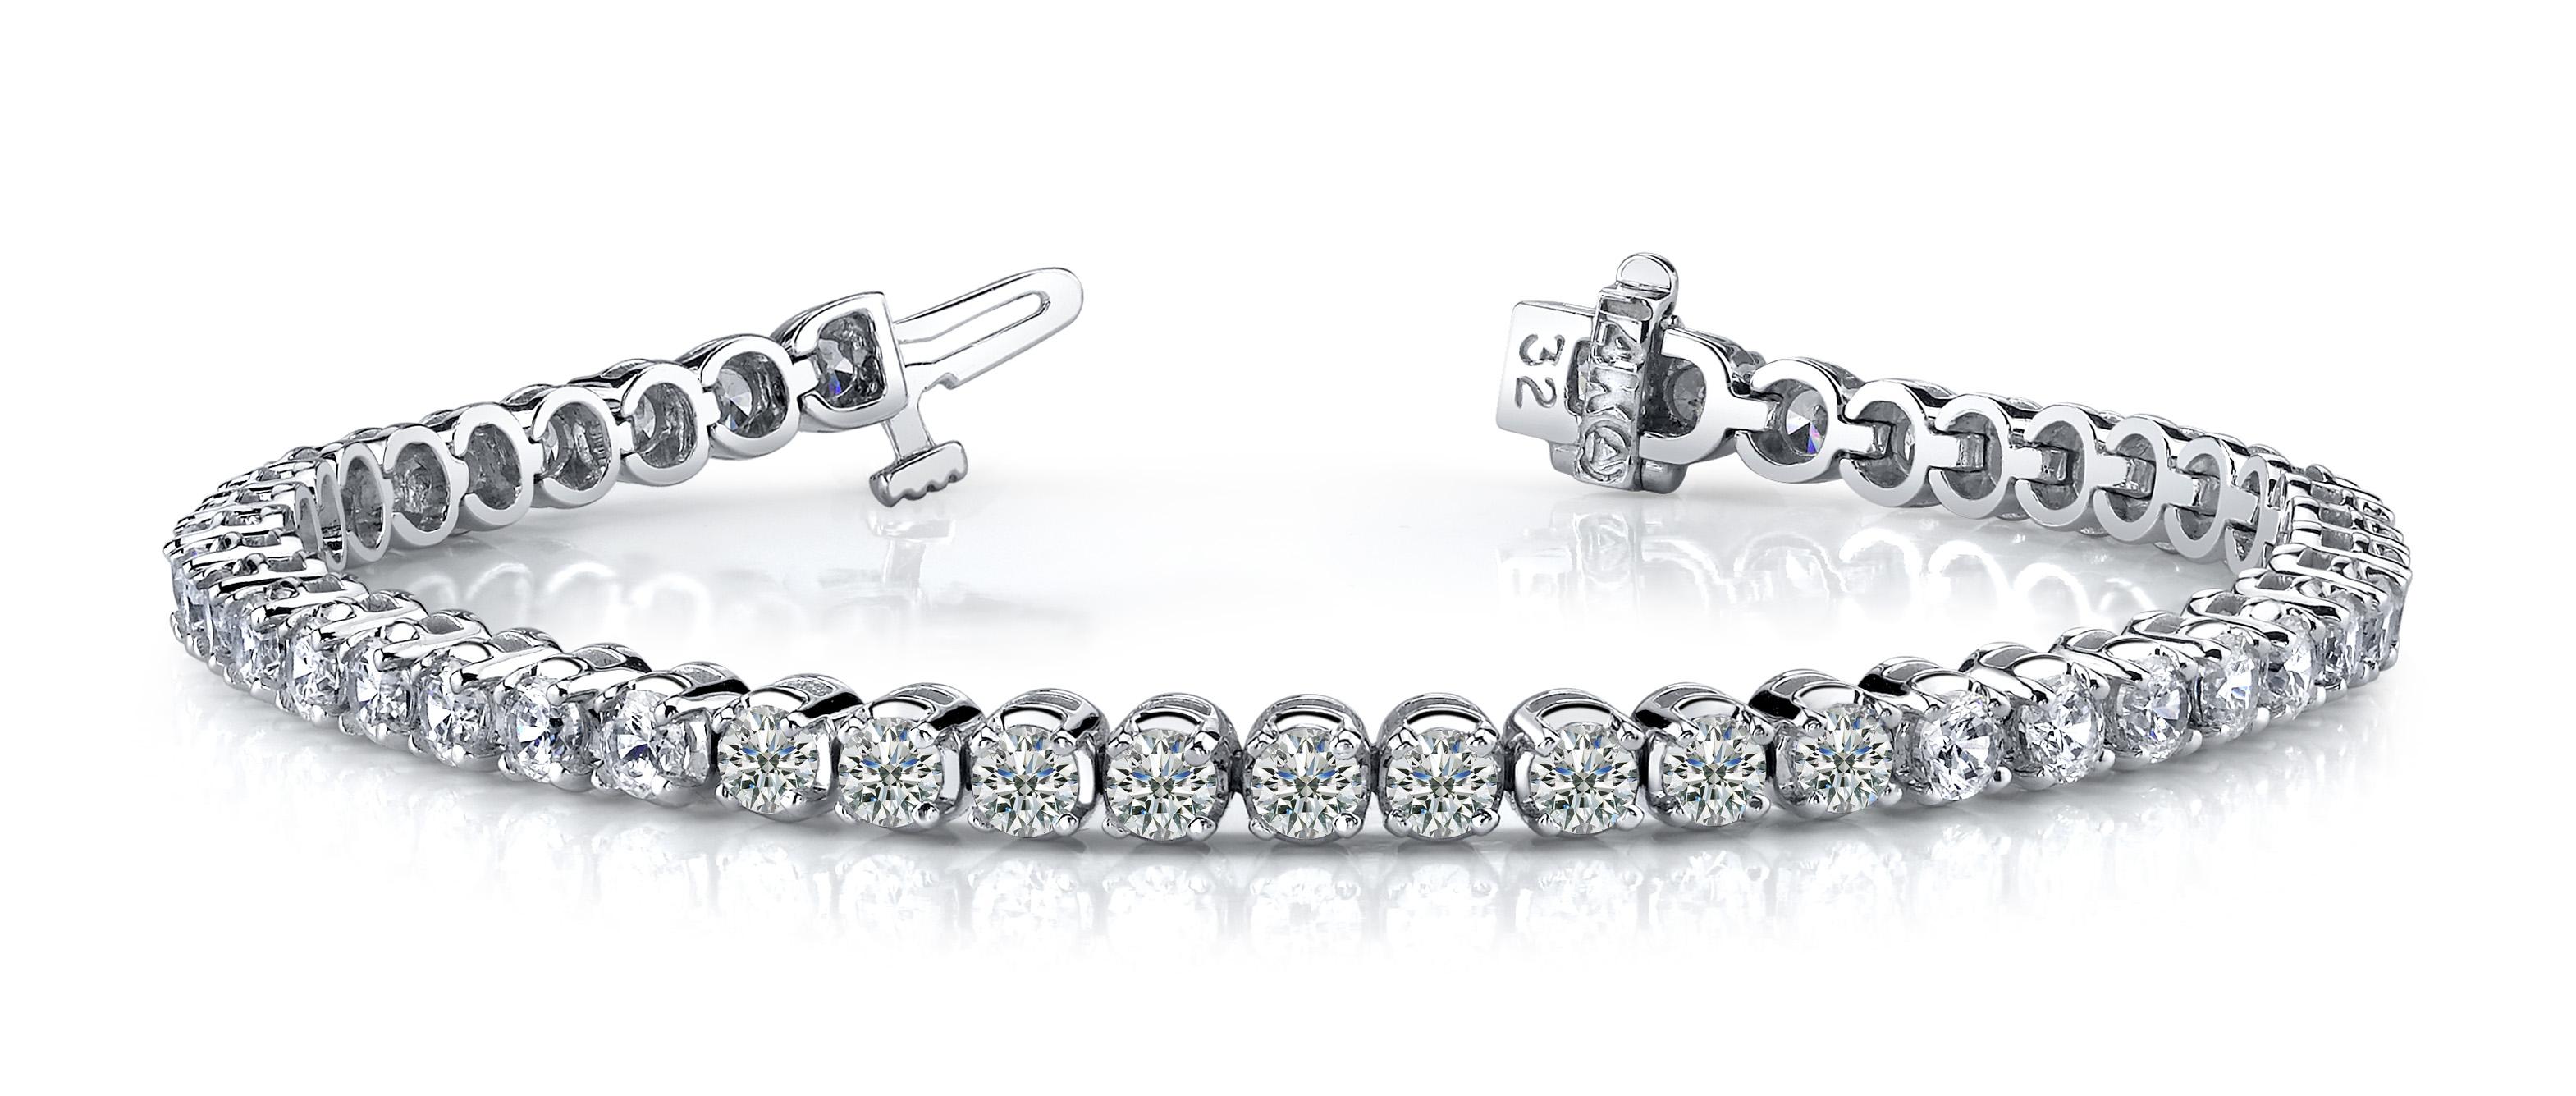 Sb871 Round Setting 4 Prong Diamond Bracelet